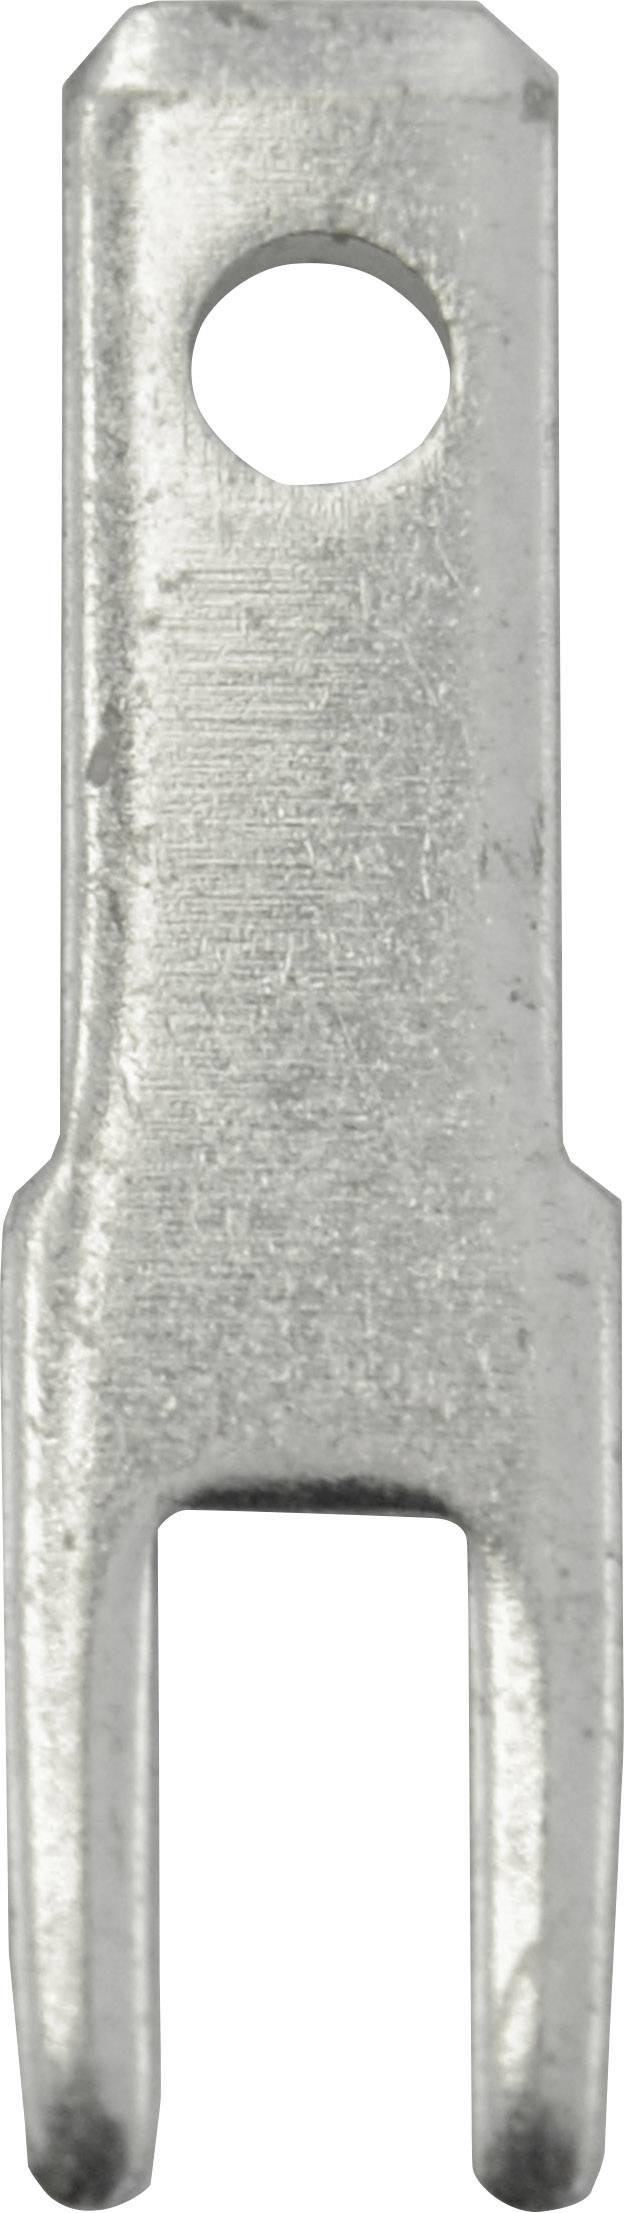 Faston zástrčka Vogt Verbindungstechnik 3785k08.68 2.8 mm x 0.8 mm, 180 °, bez izolace, kov, 100 ks